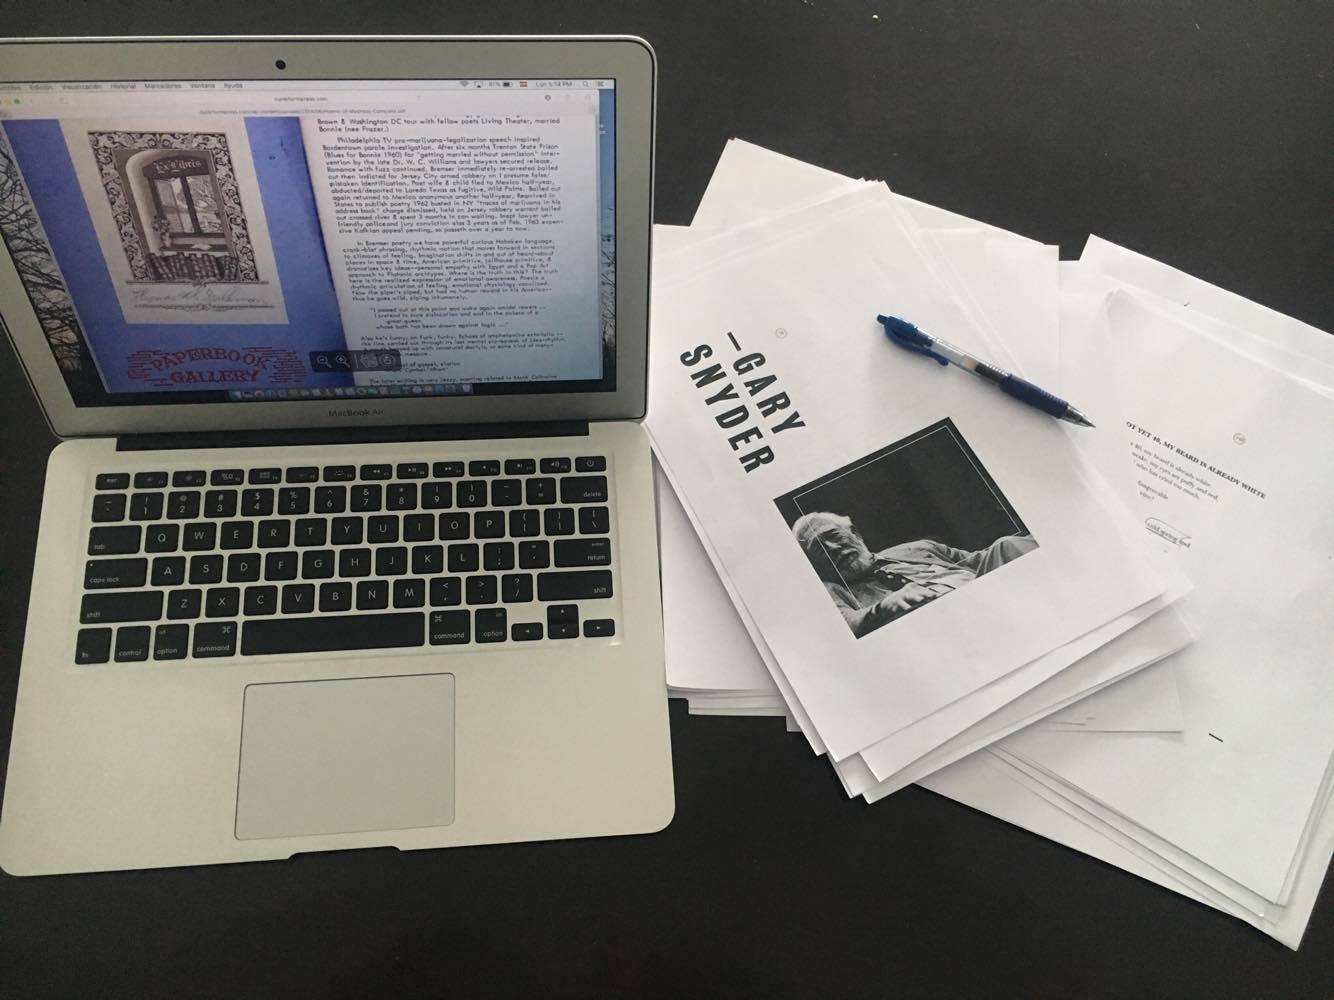 Writing, editing, and reading poetry. Photo Credit: Mariano Rolando Andrade